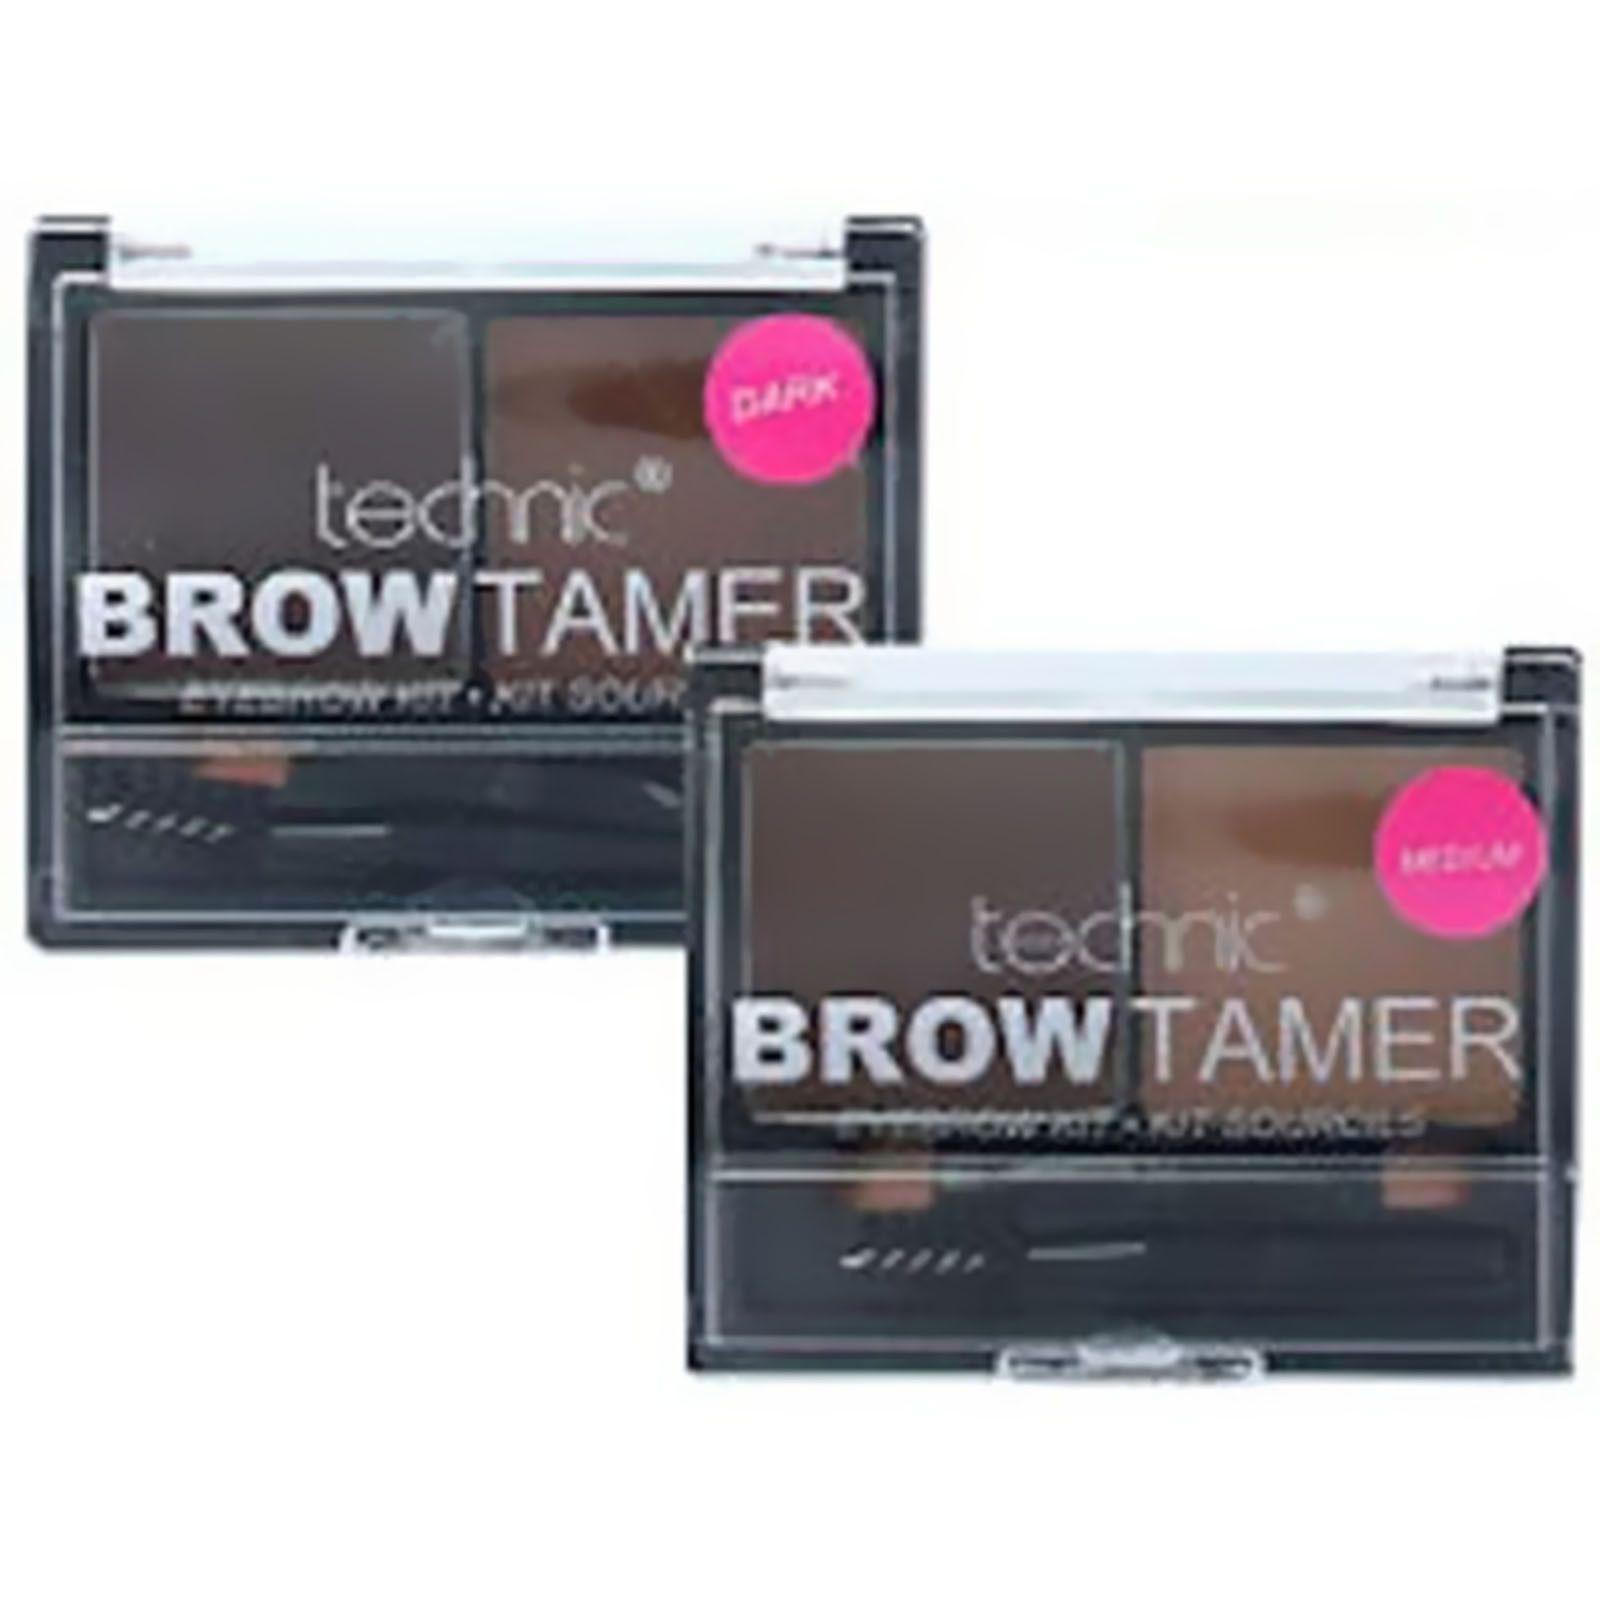 Technic Brow Tamer Medium Dark Eyebrow Shaping Kit Wax Power With